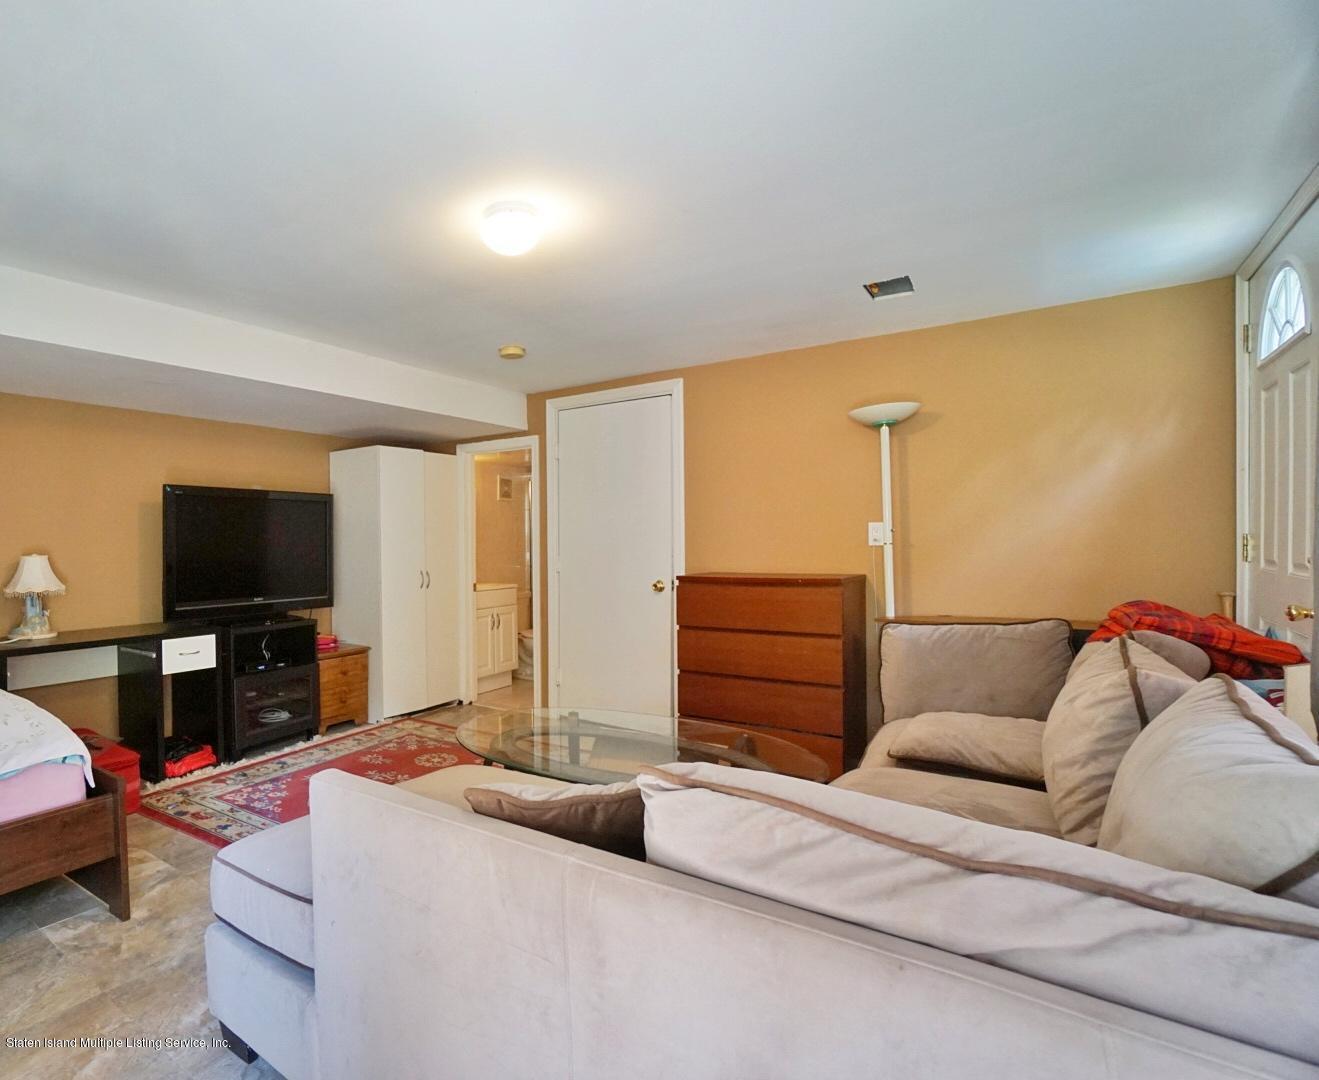 Single Family - Semi-Attached 36 Zwicky Avenue  Staten Island, NY 10306, MLS-1131911-25